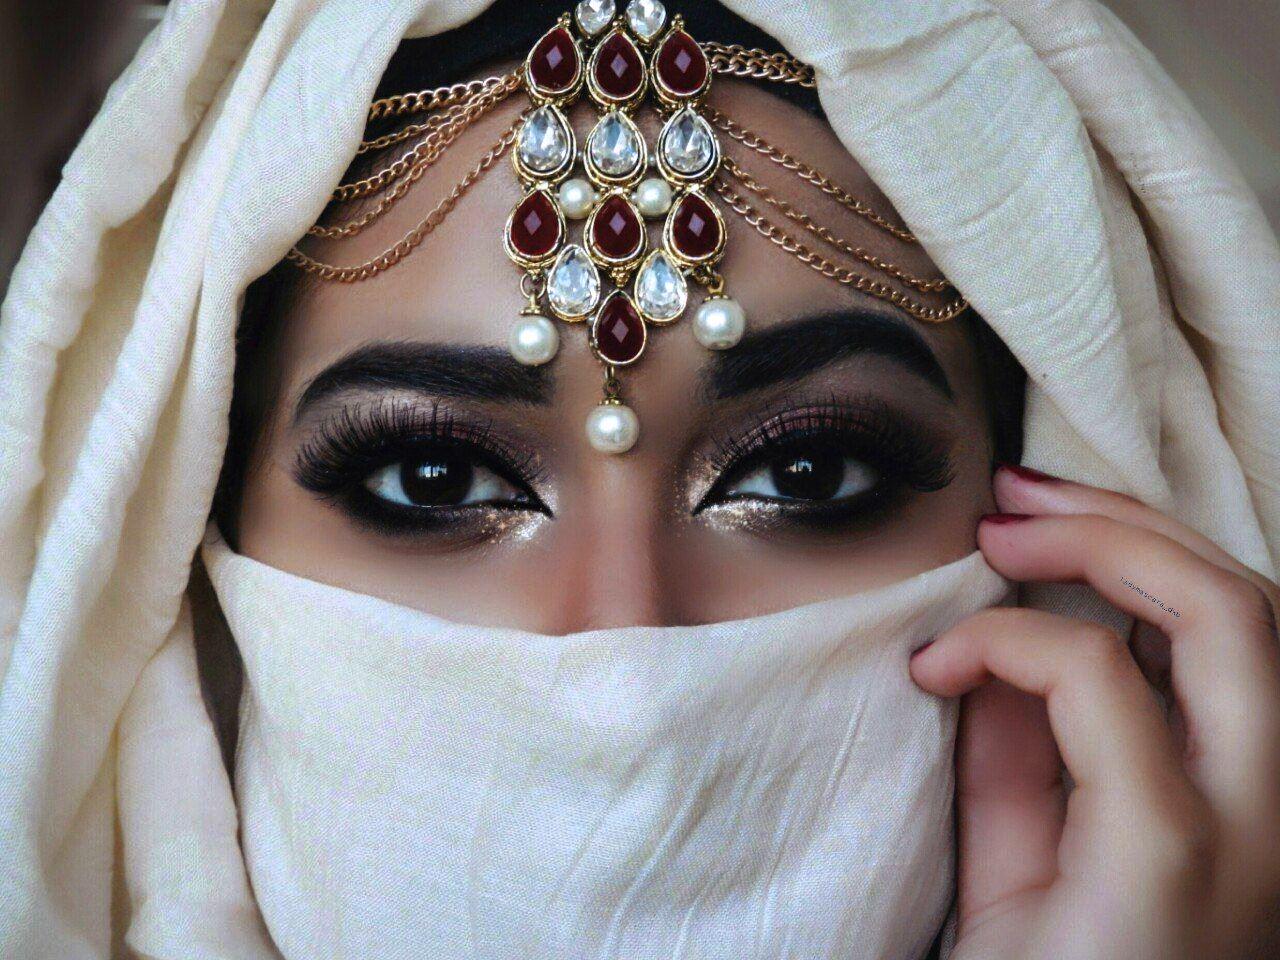 Значение имени Азалия — как влияет на ее судьбу и характер